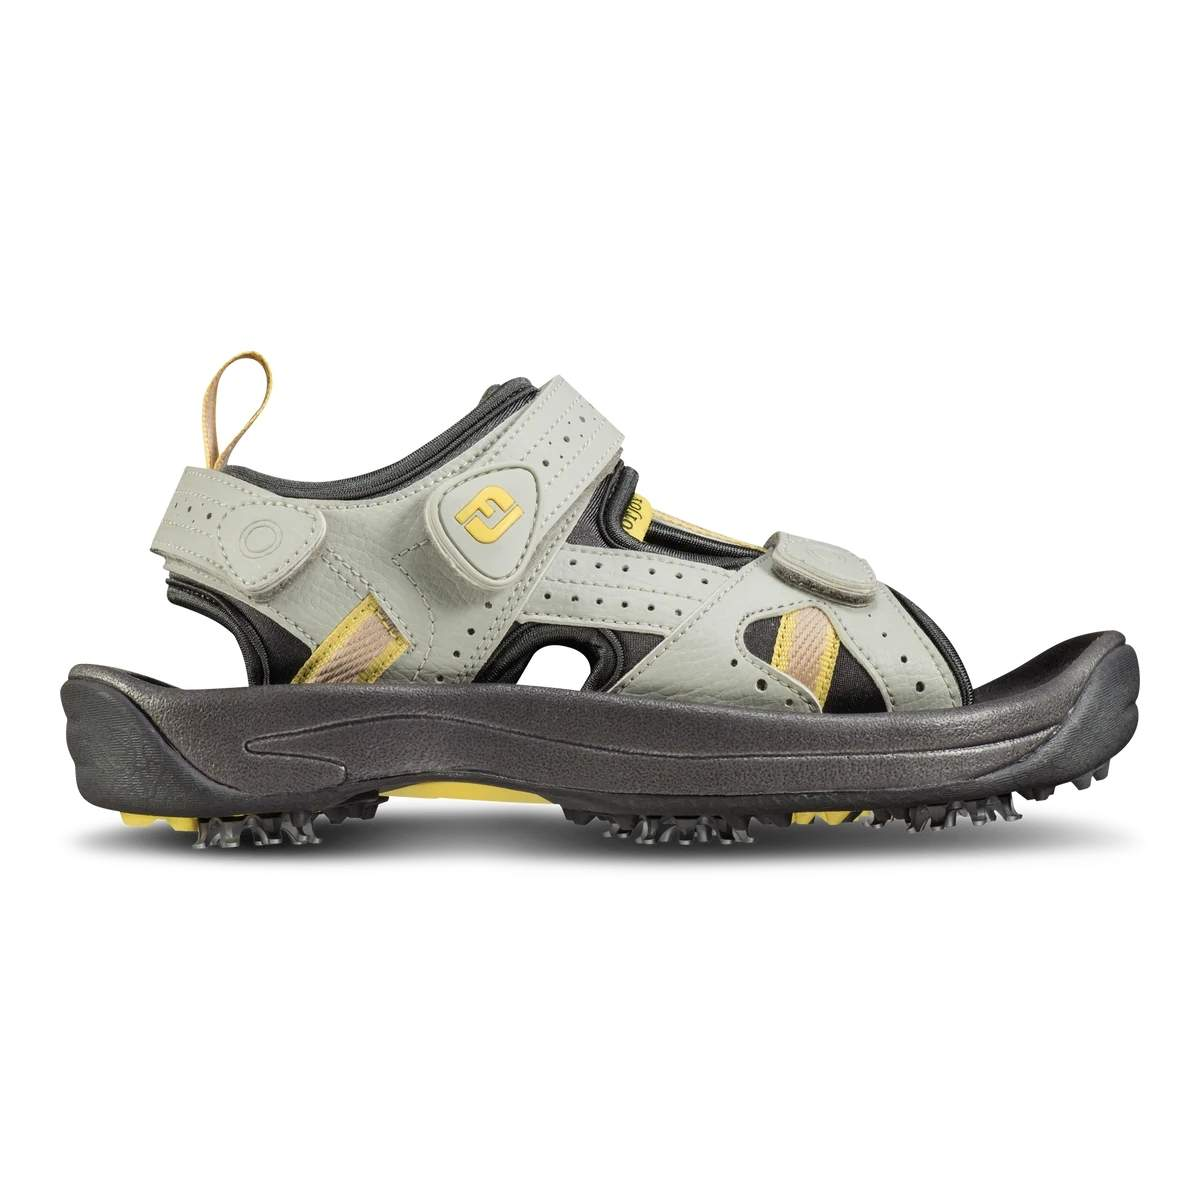 FootJoy Women's Golf Sandal - FJ Style 48488